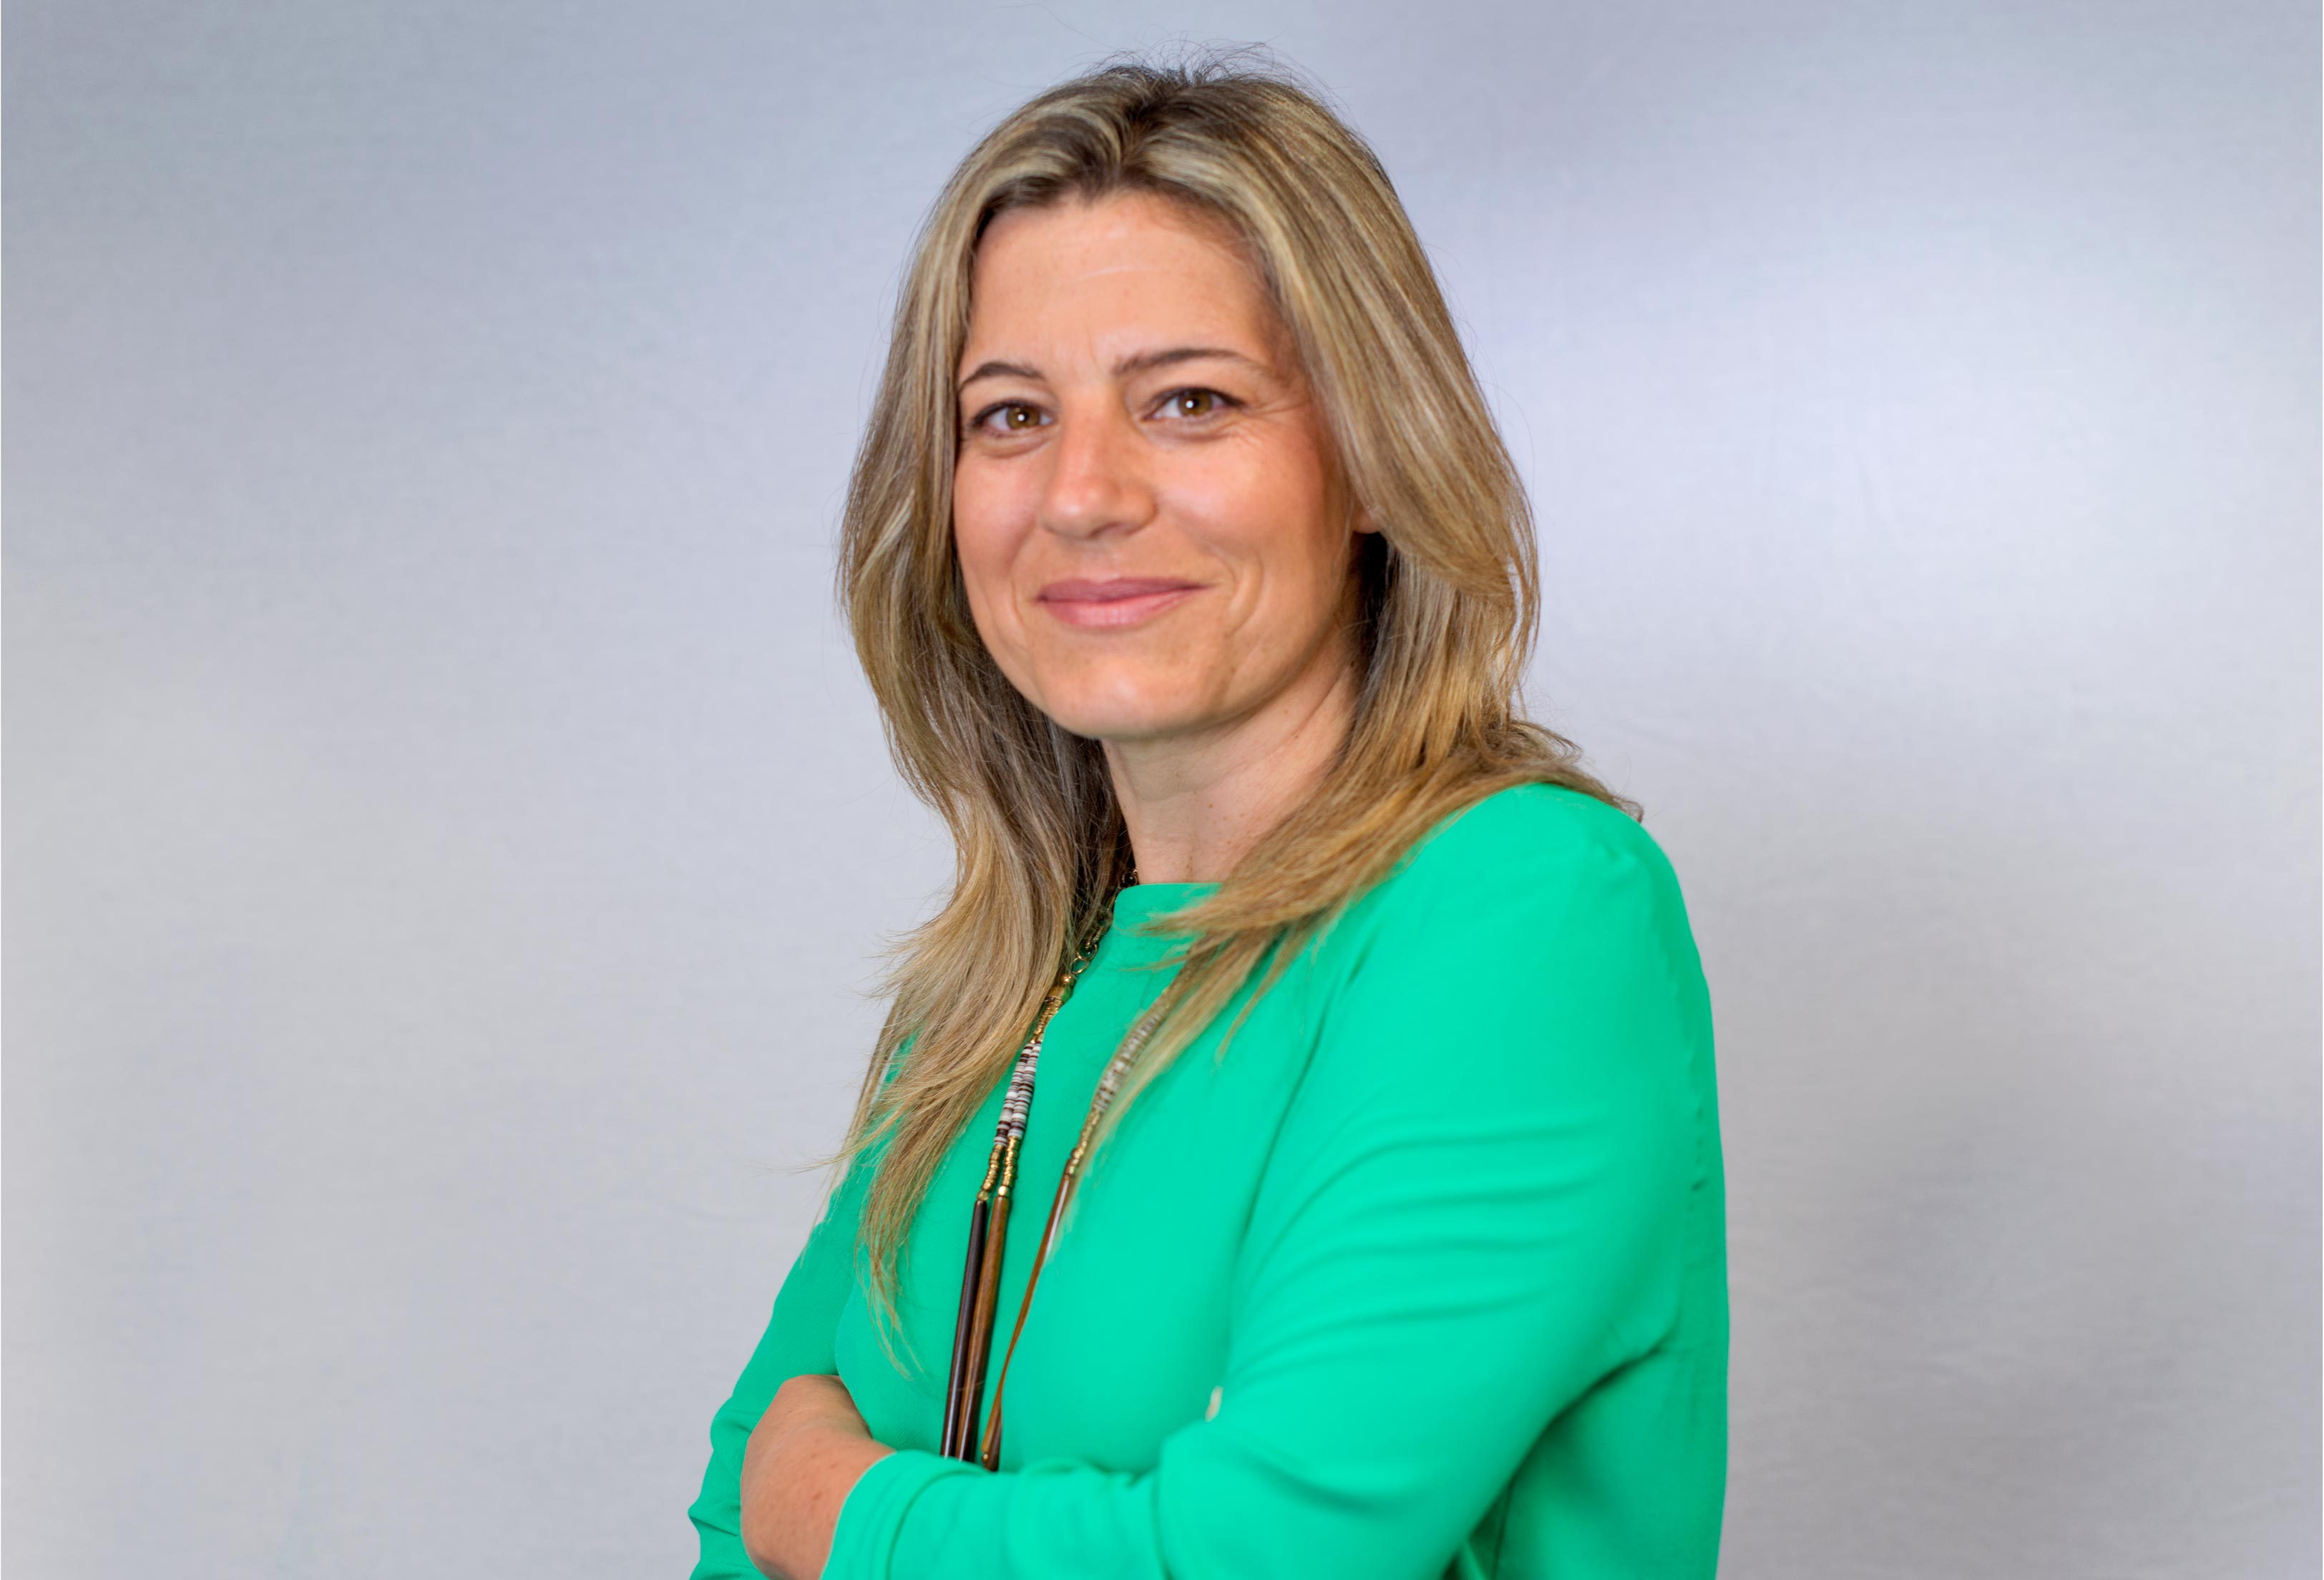 Sonia Alcodorí Fuster